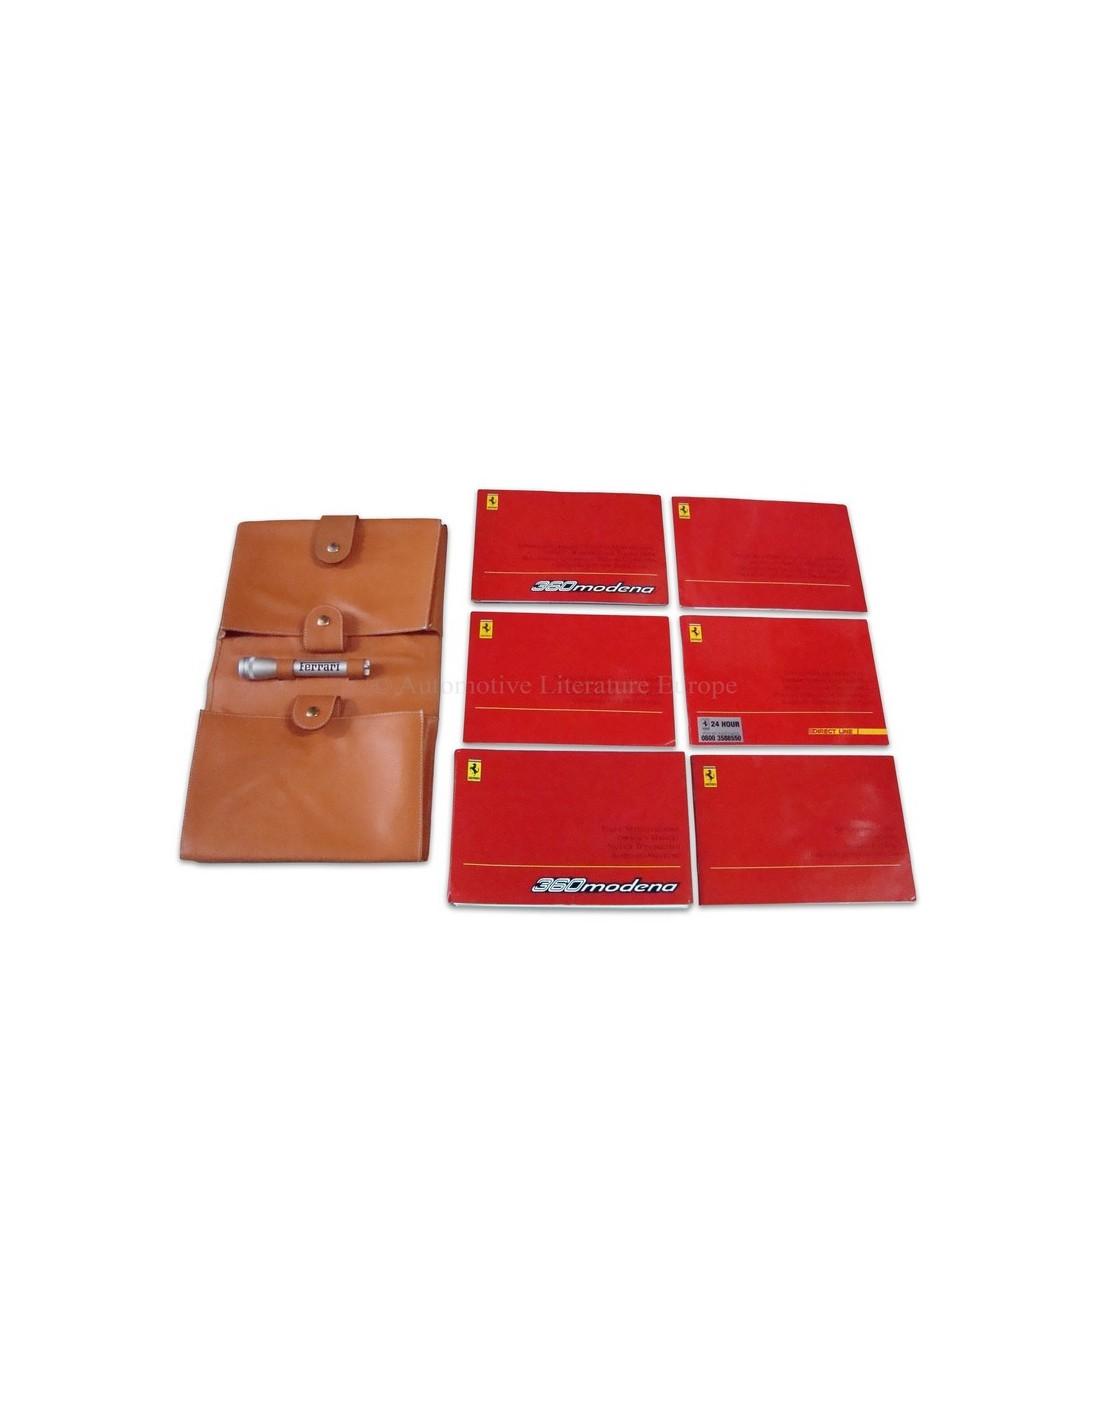 Ferrari Repair Manuals: 2000 FERRARI 360 MODENA COMPLETE POUCH OWNER'S MANUAL UK